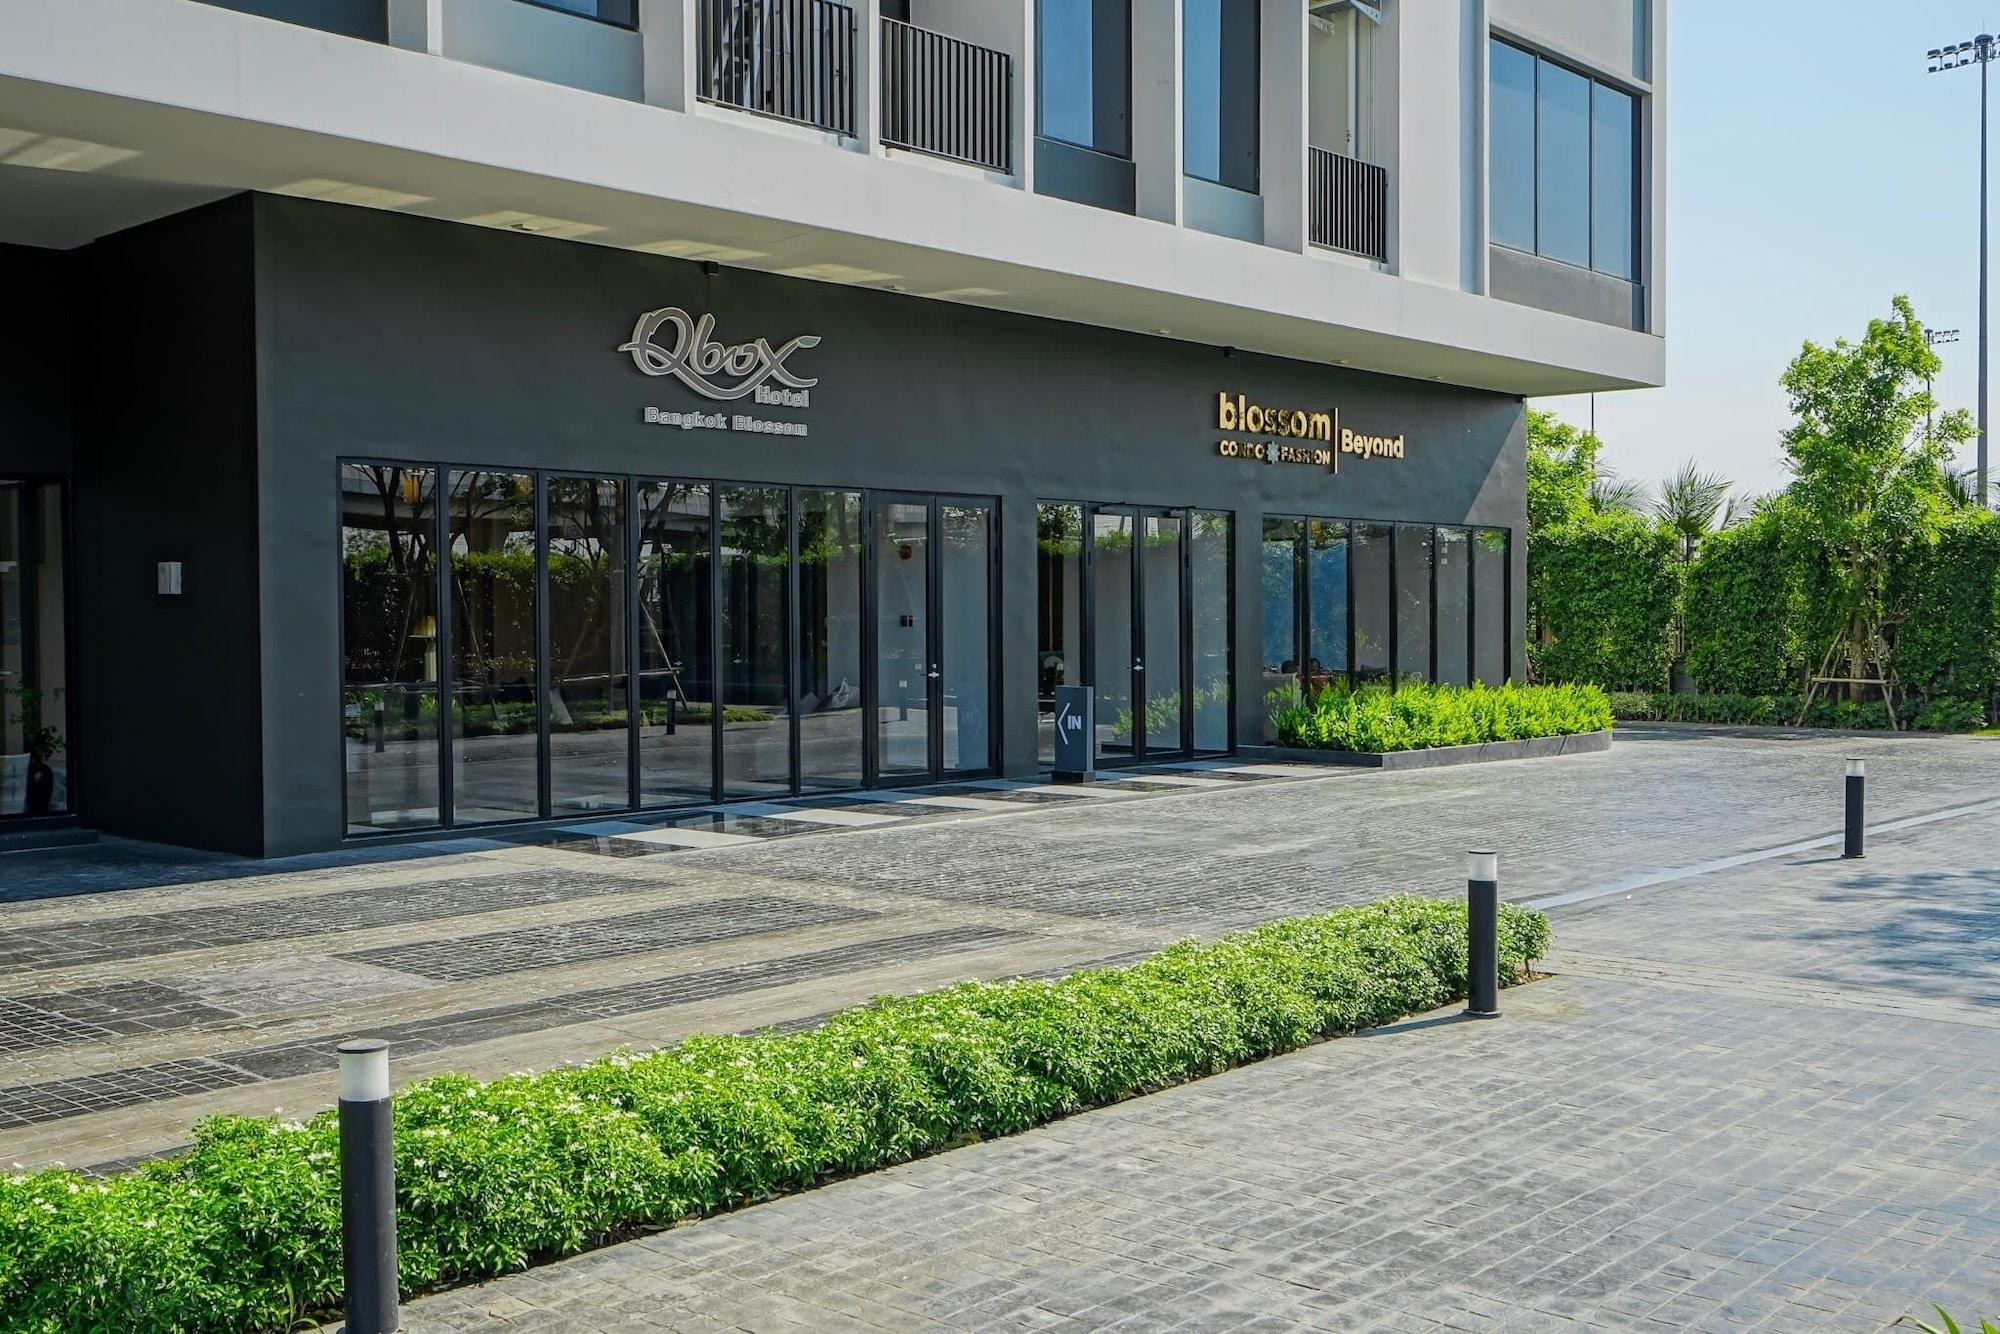 Q-Box Hotel Bangkok Blossom, Khan Na Yao